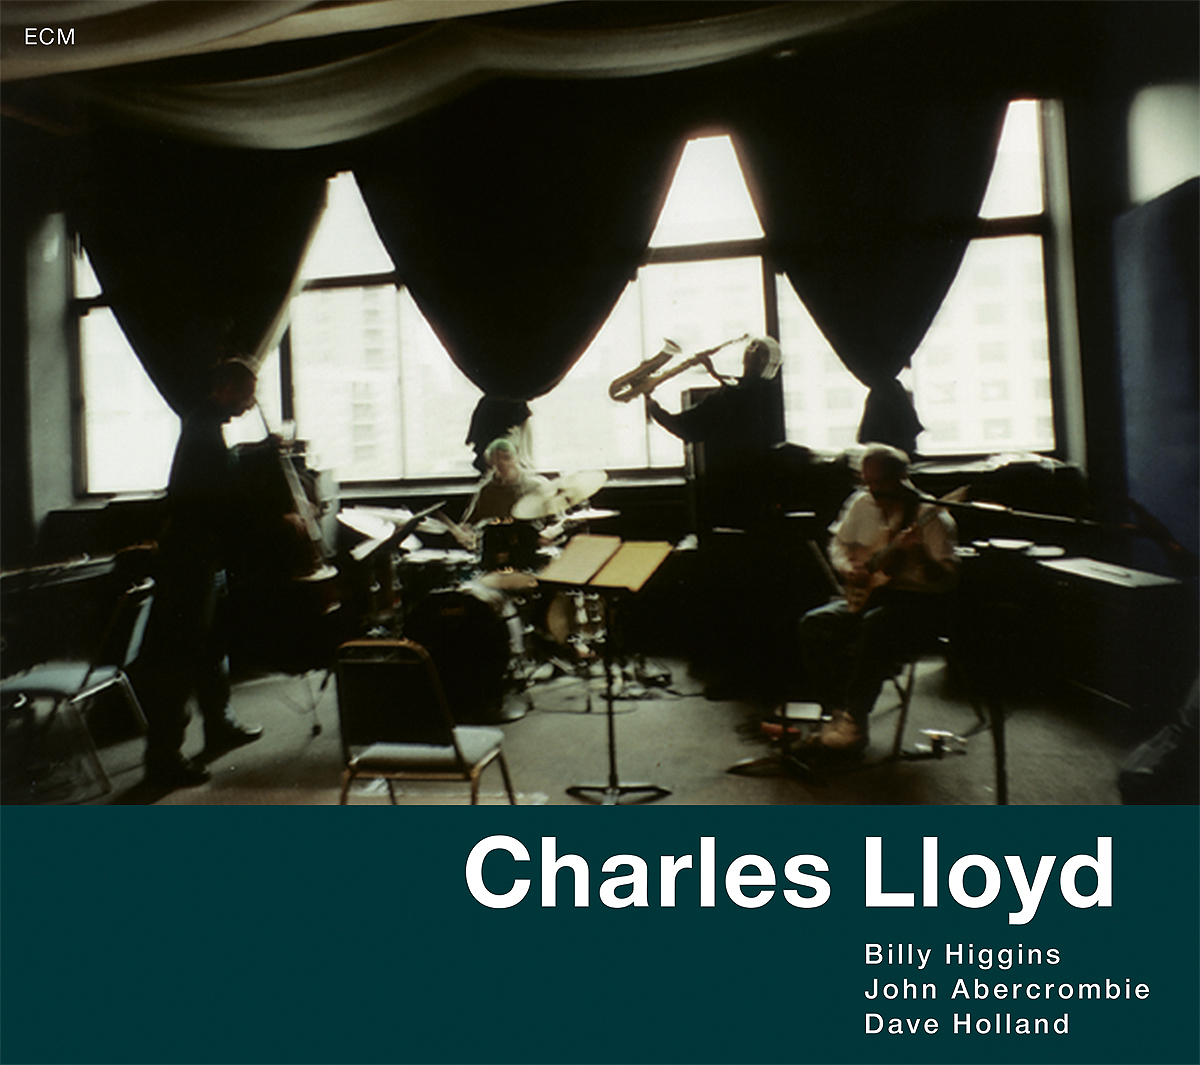 Чарльз Ллойд,Джон Аберкромби,Дэйв Холланд,Билли Хиггинс Charles Lloyd. Voice In The Night (2 LP)